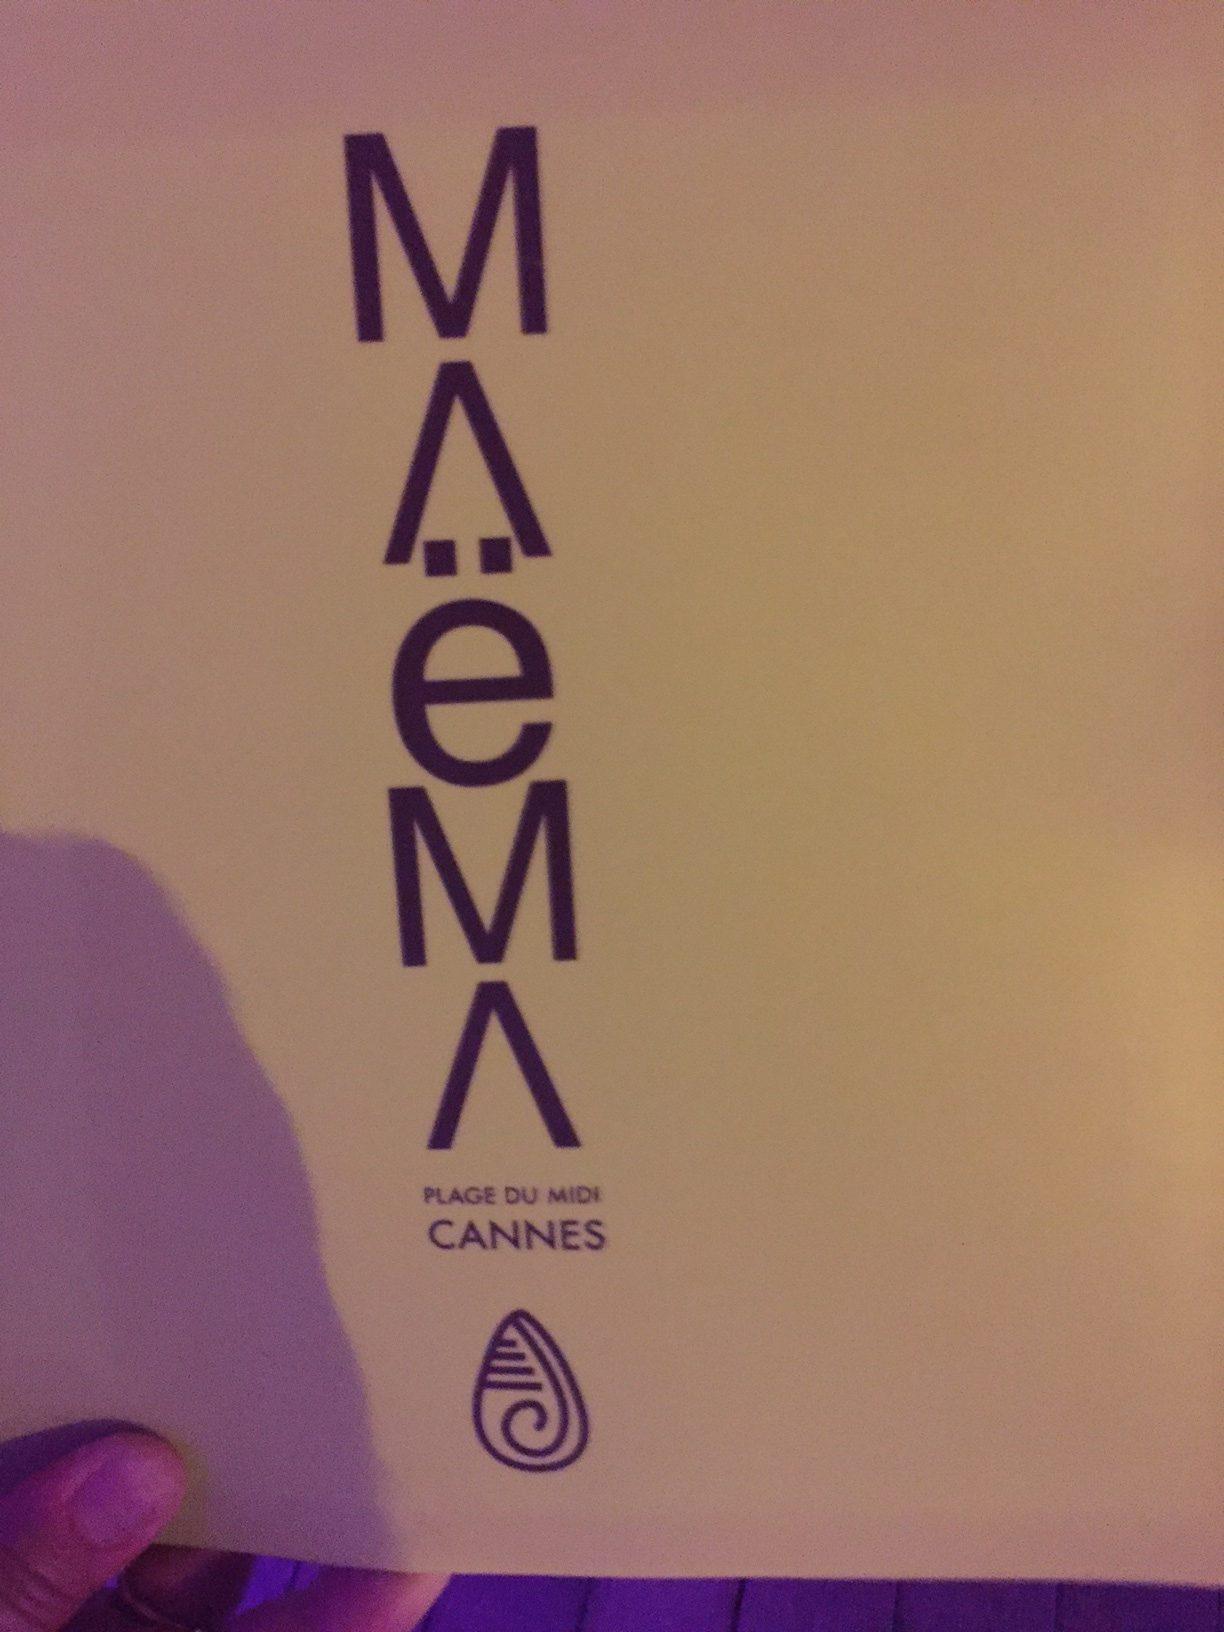 Restaurant Beachclub Maema Cannes